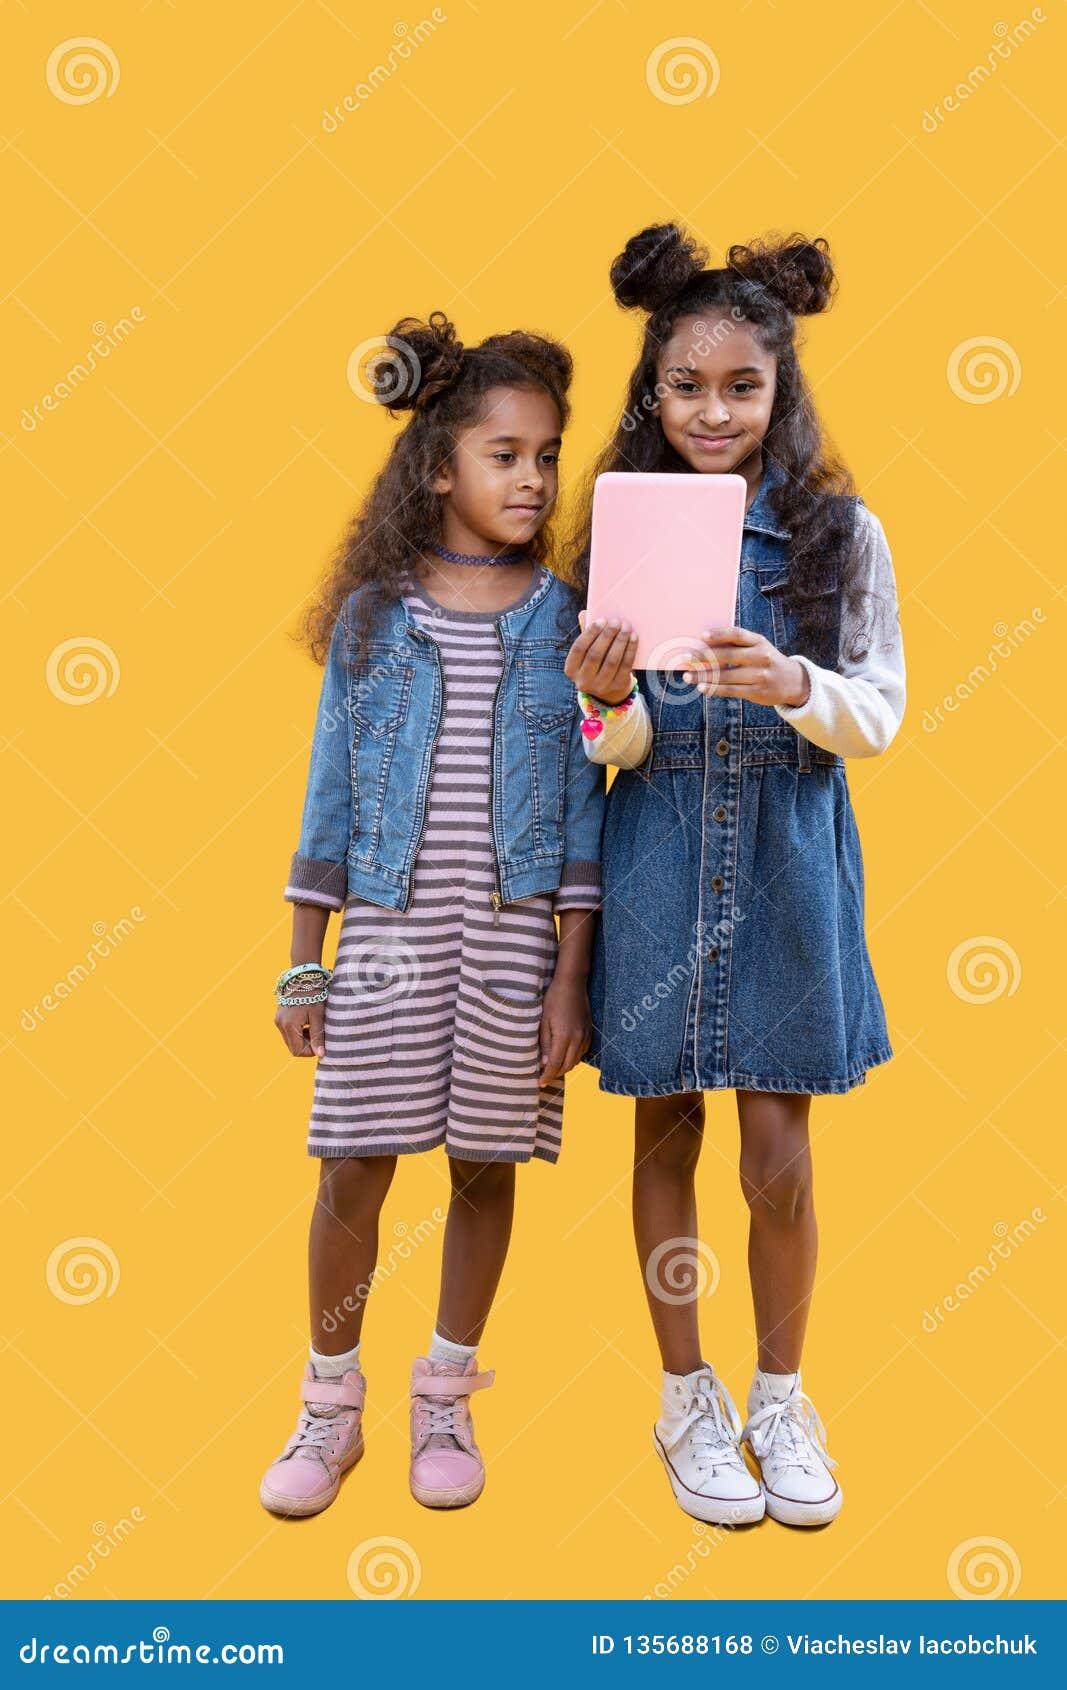 Cute pretty young girls using modern technology